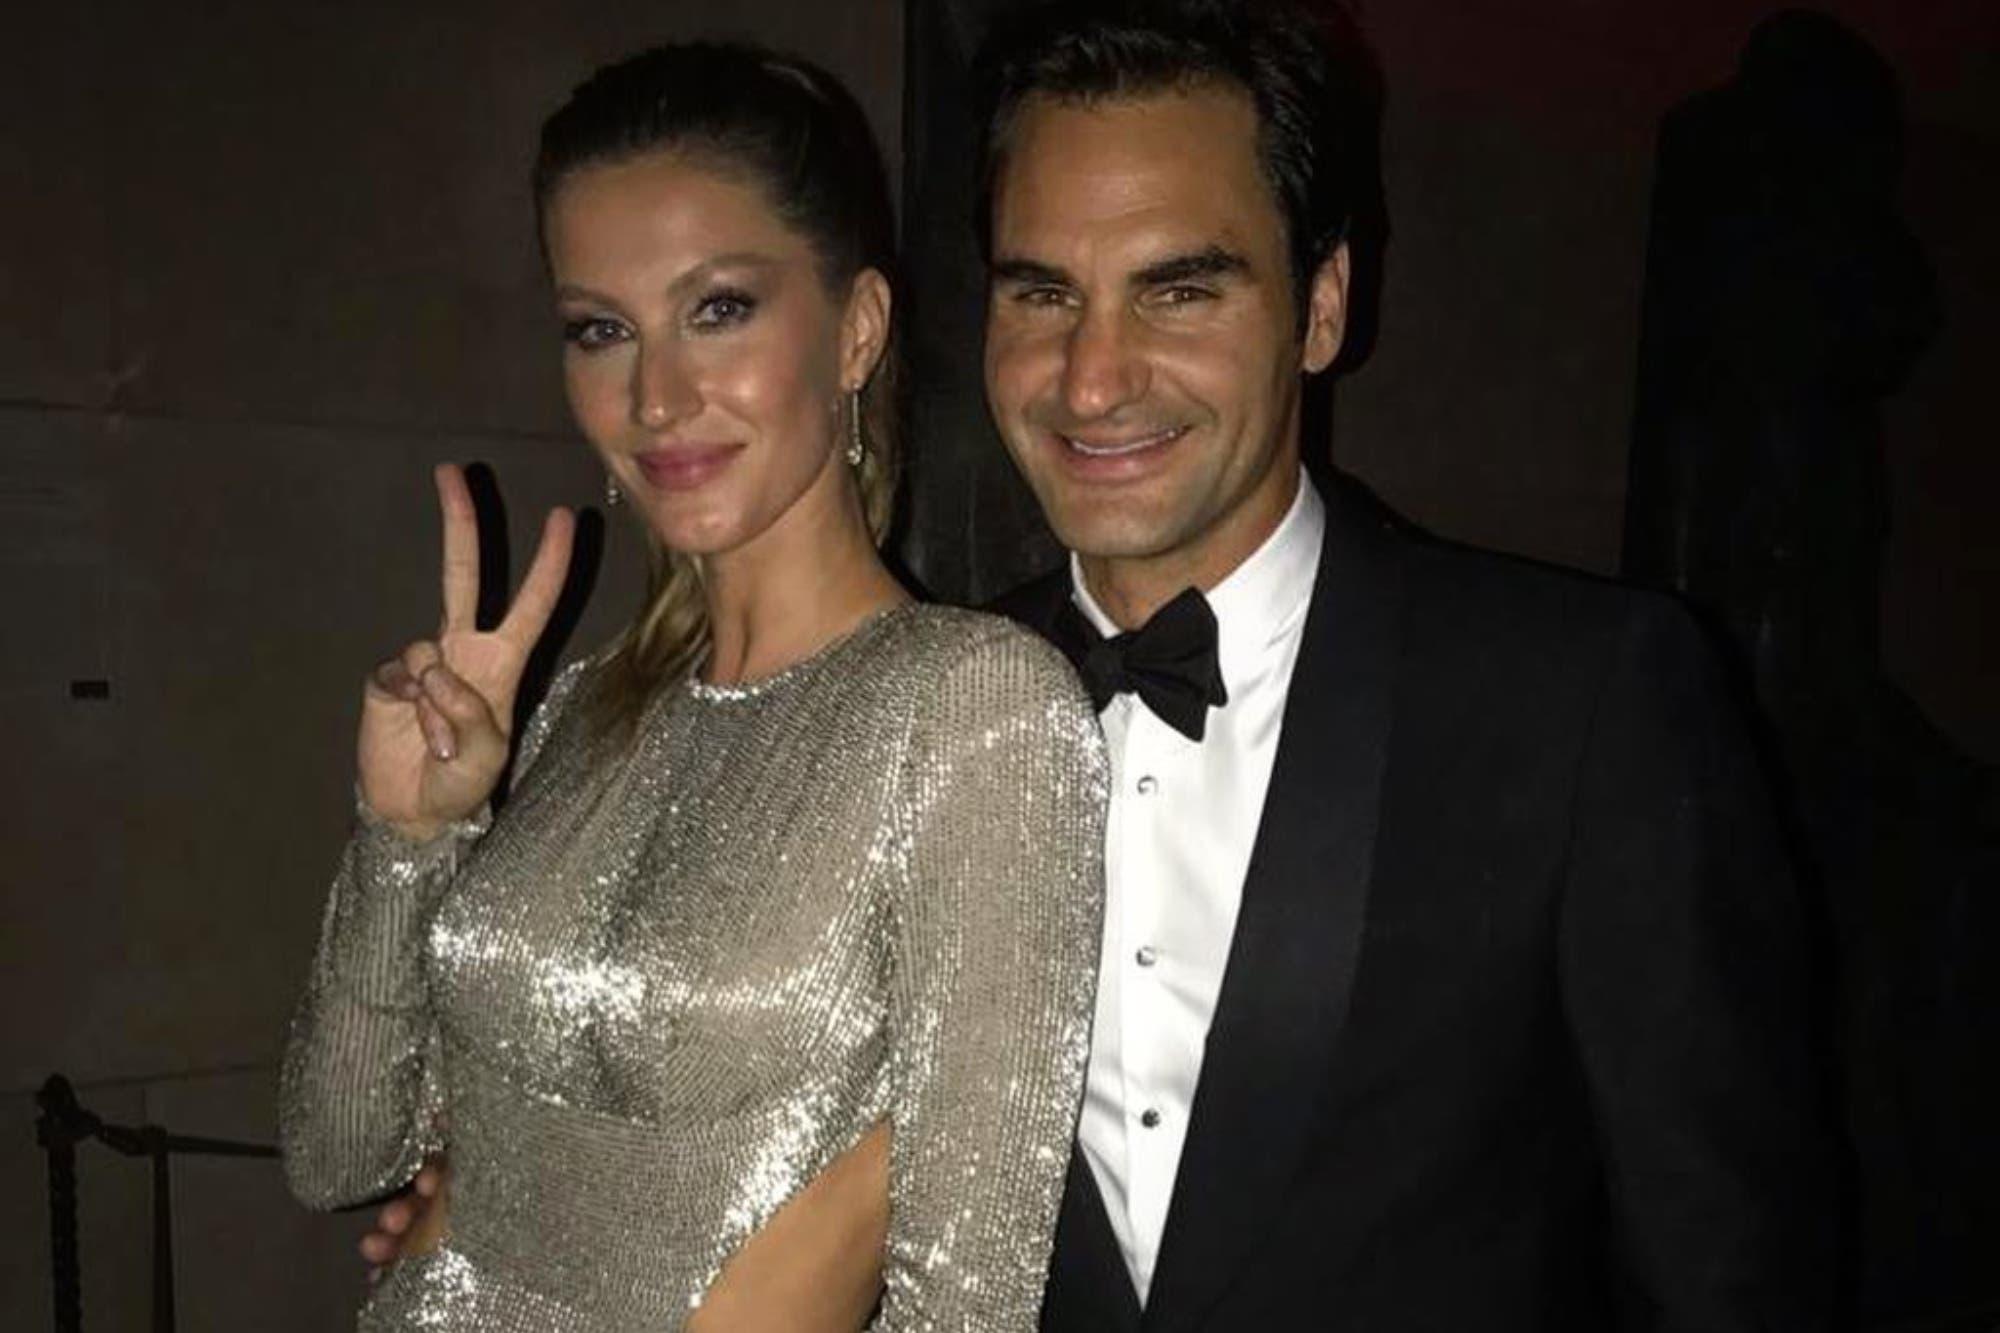 La foto de Roger Federer con Gisele Bündchen que generó revuelo en las redes